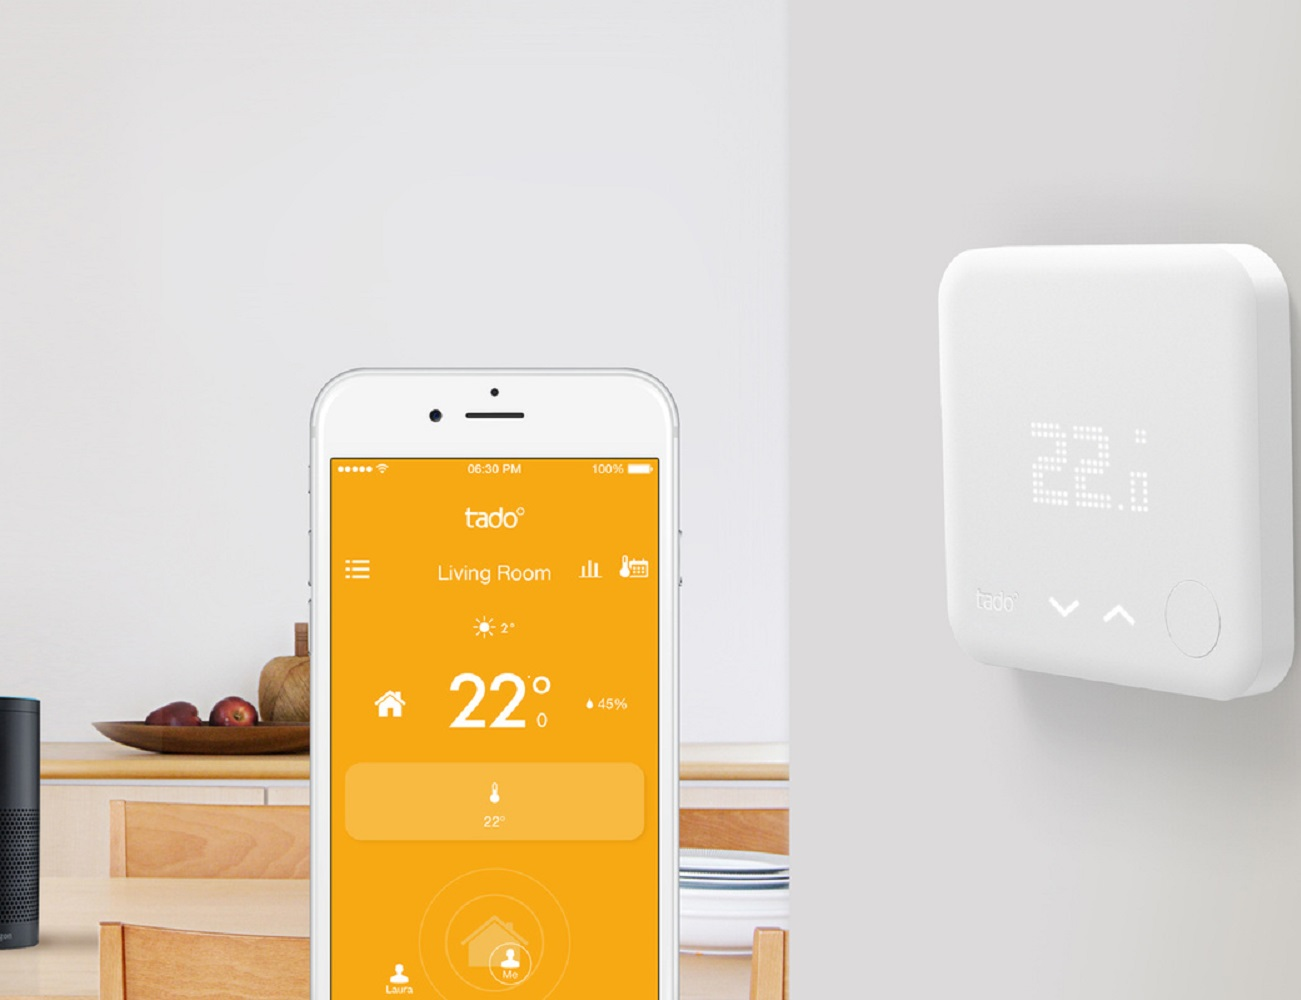 Tado Smart Thermostat 2.0